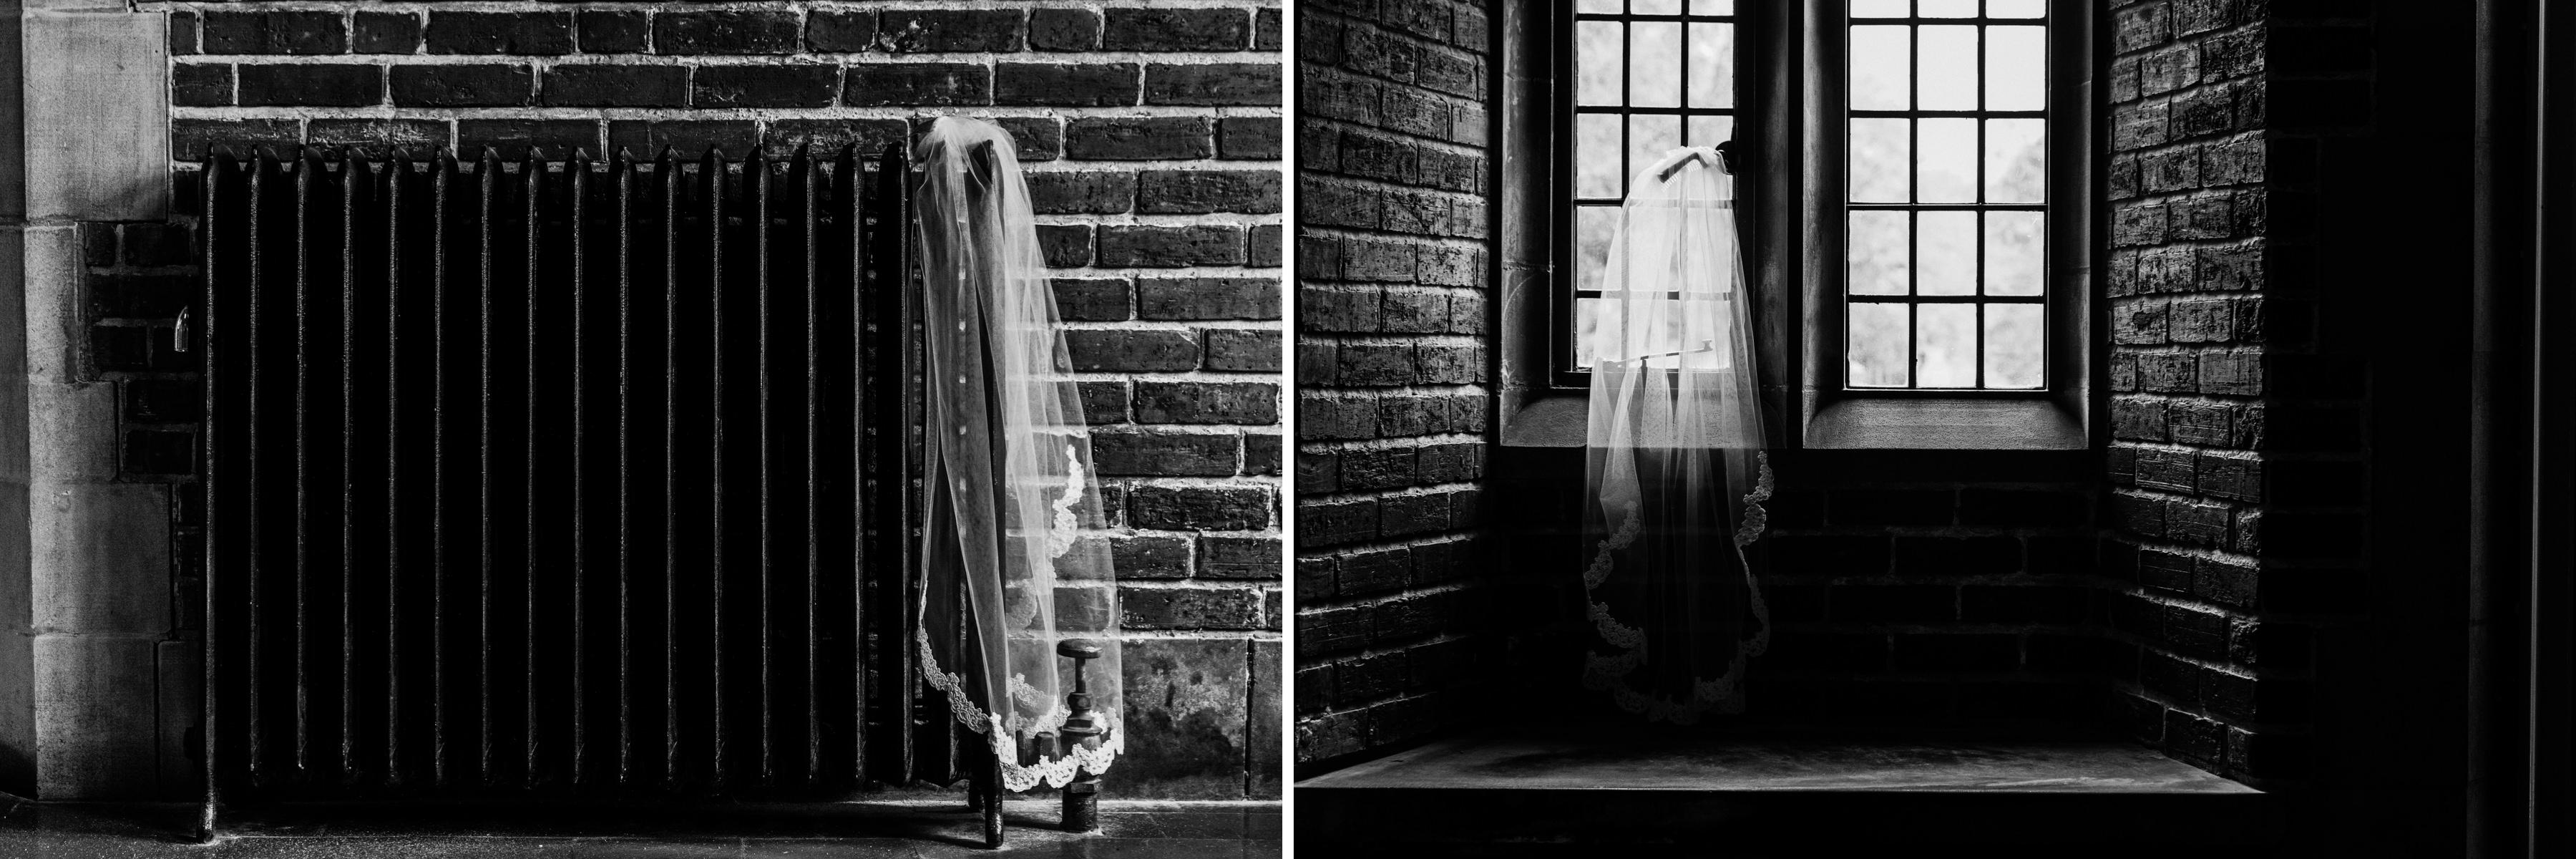 MAULDIN_WEDDING_MONTGOMERY_ALABAMA_WEDDING_PHOTOGRAPHY_11